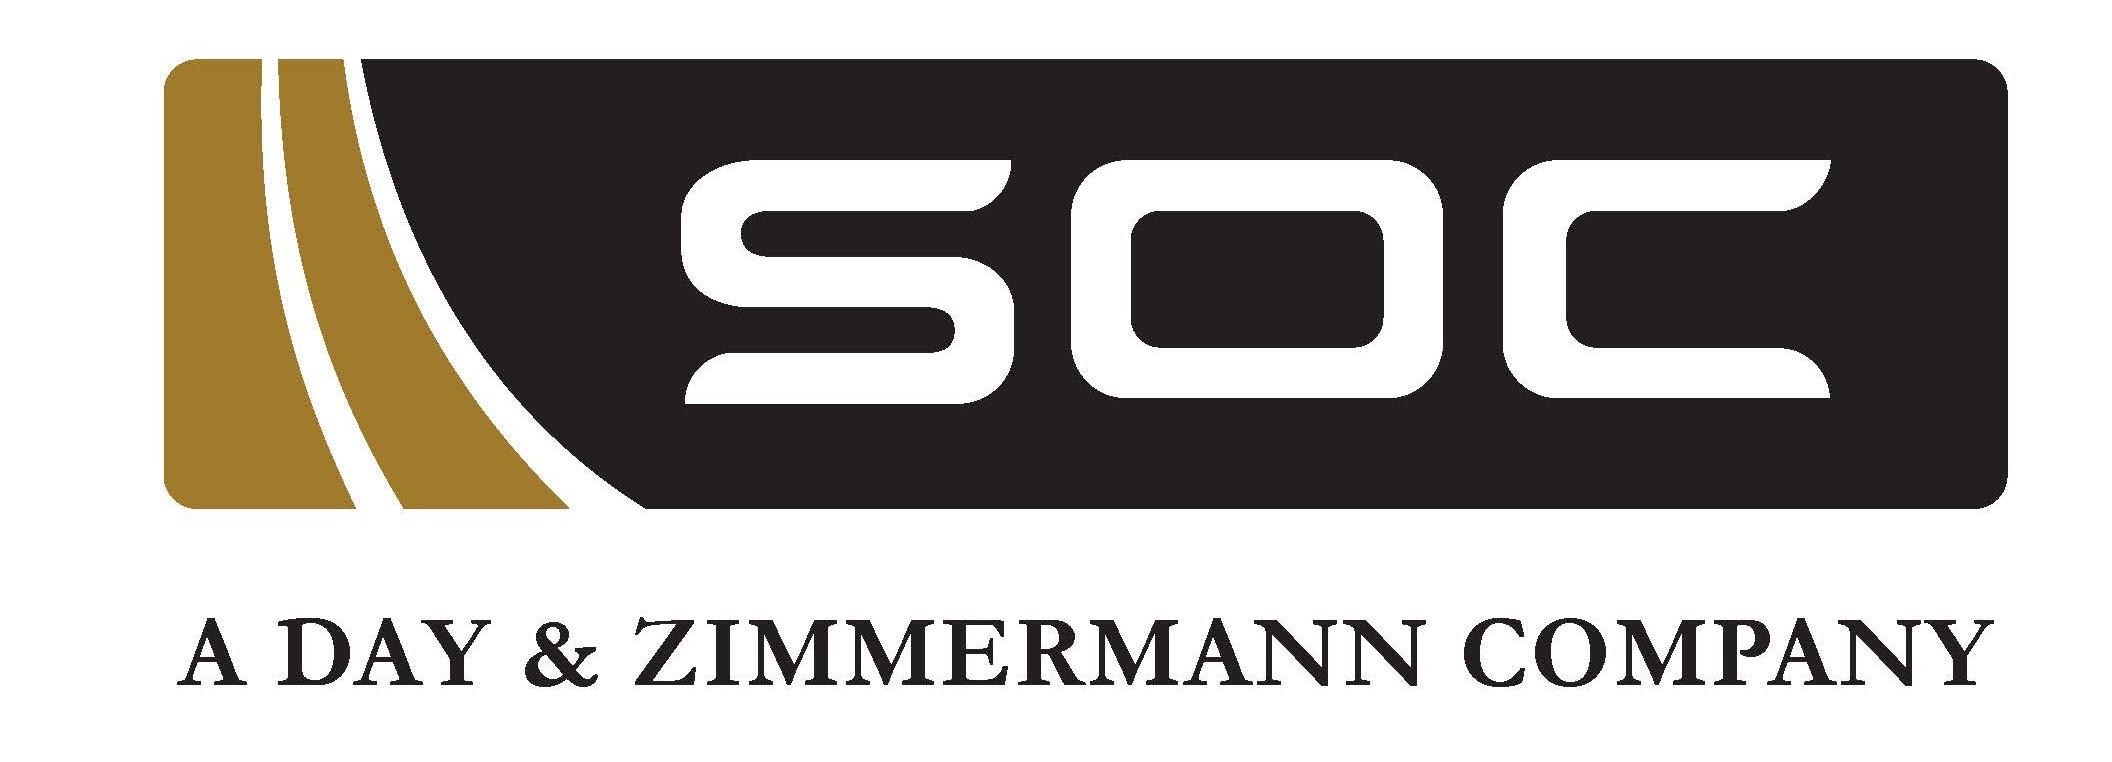 SOC_DZ_Logo cropped.jpg